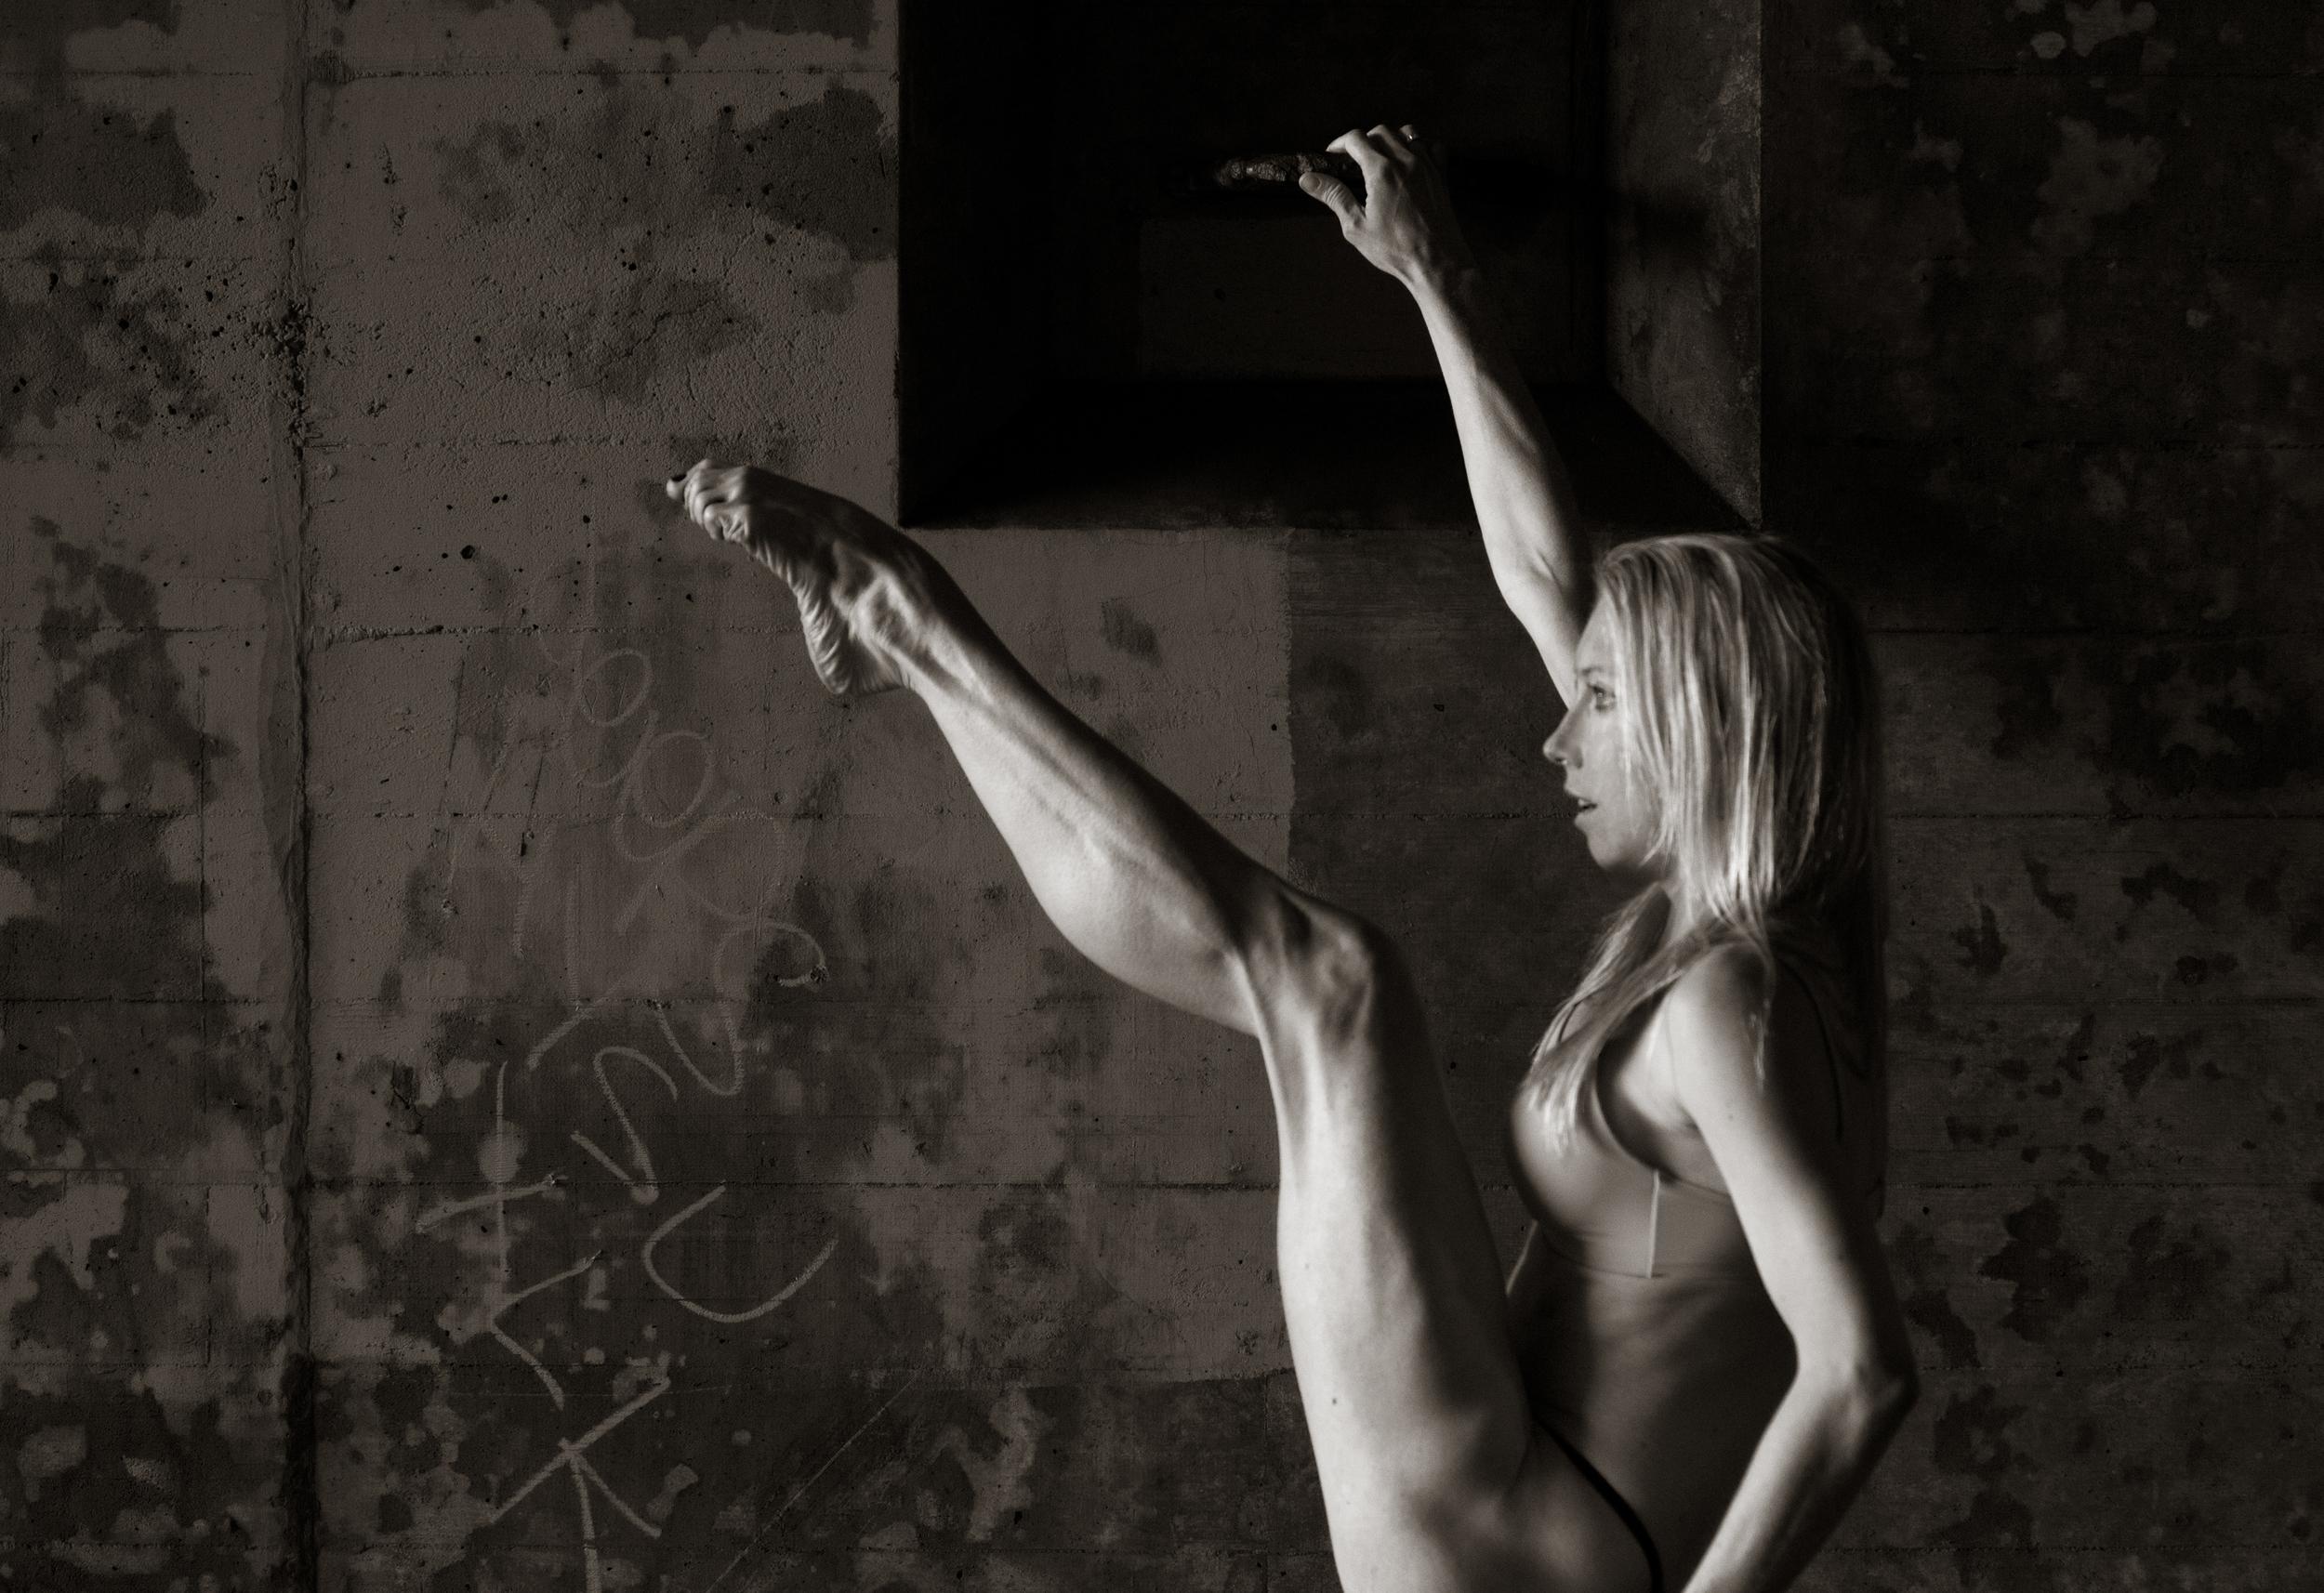 Margaret Karl at the 2014 DanceFAR photoshoot. Photo by Sandy Lee.